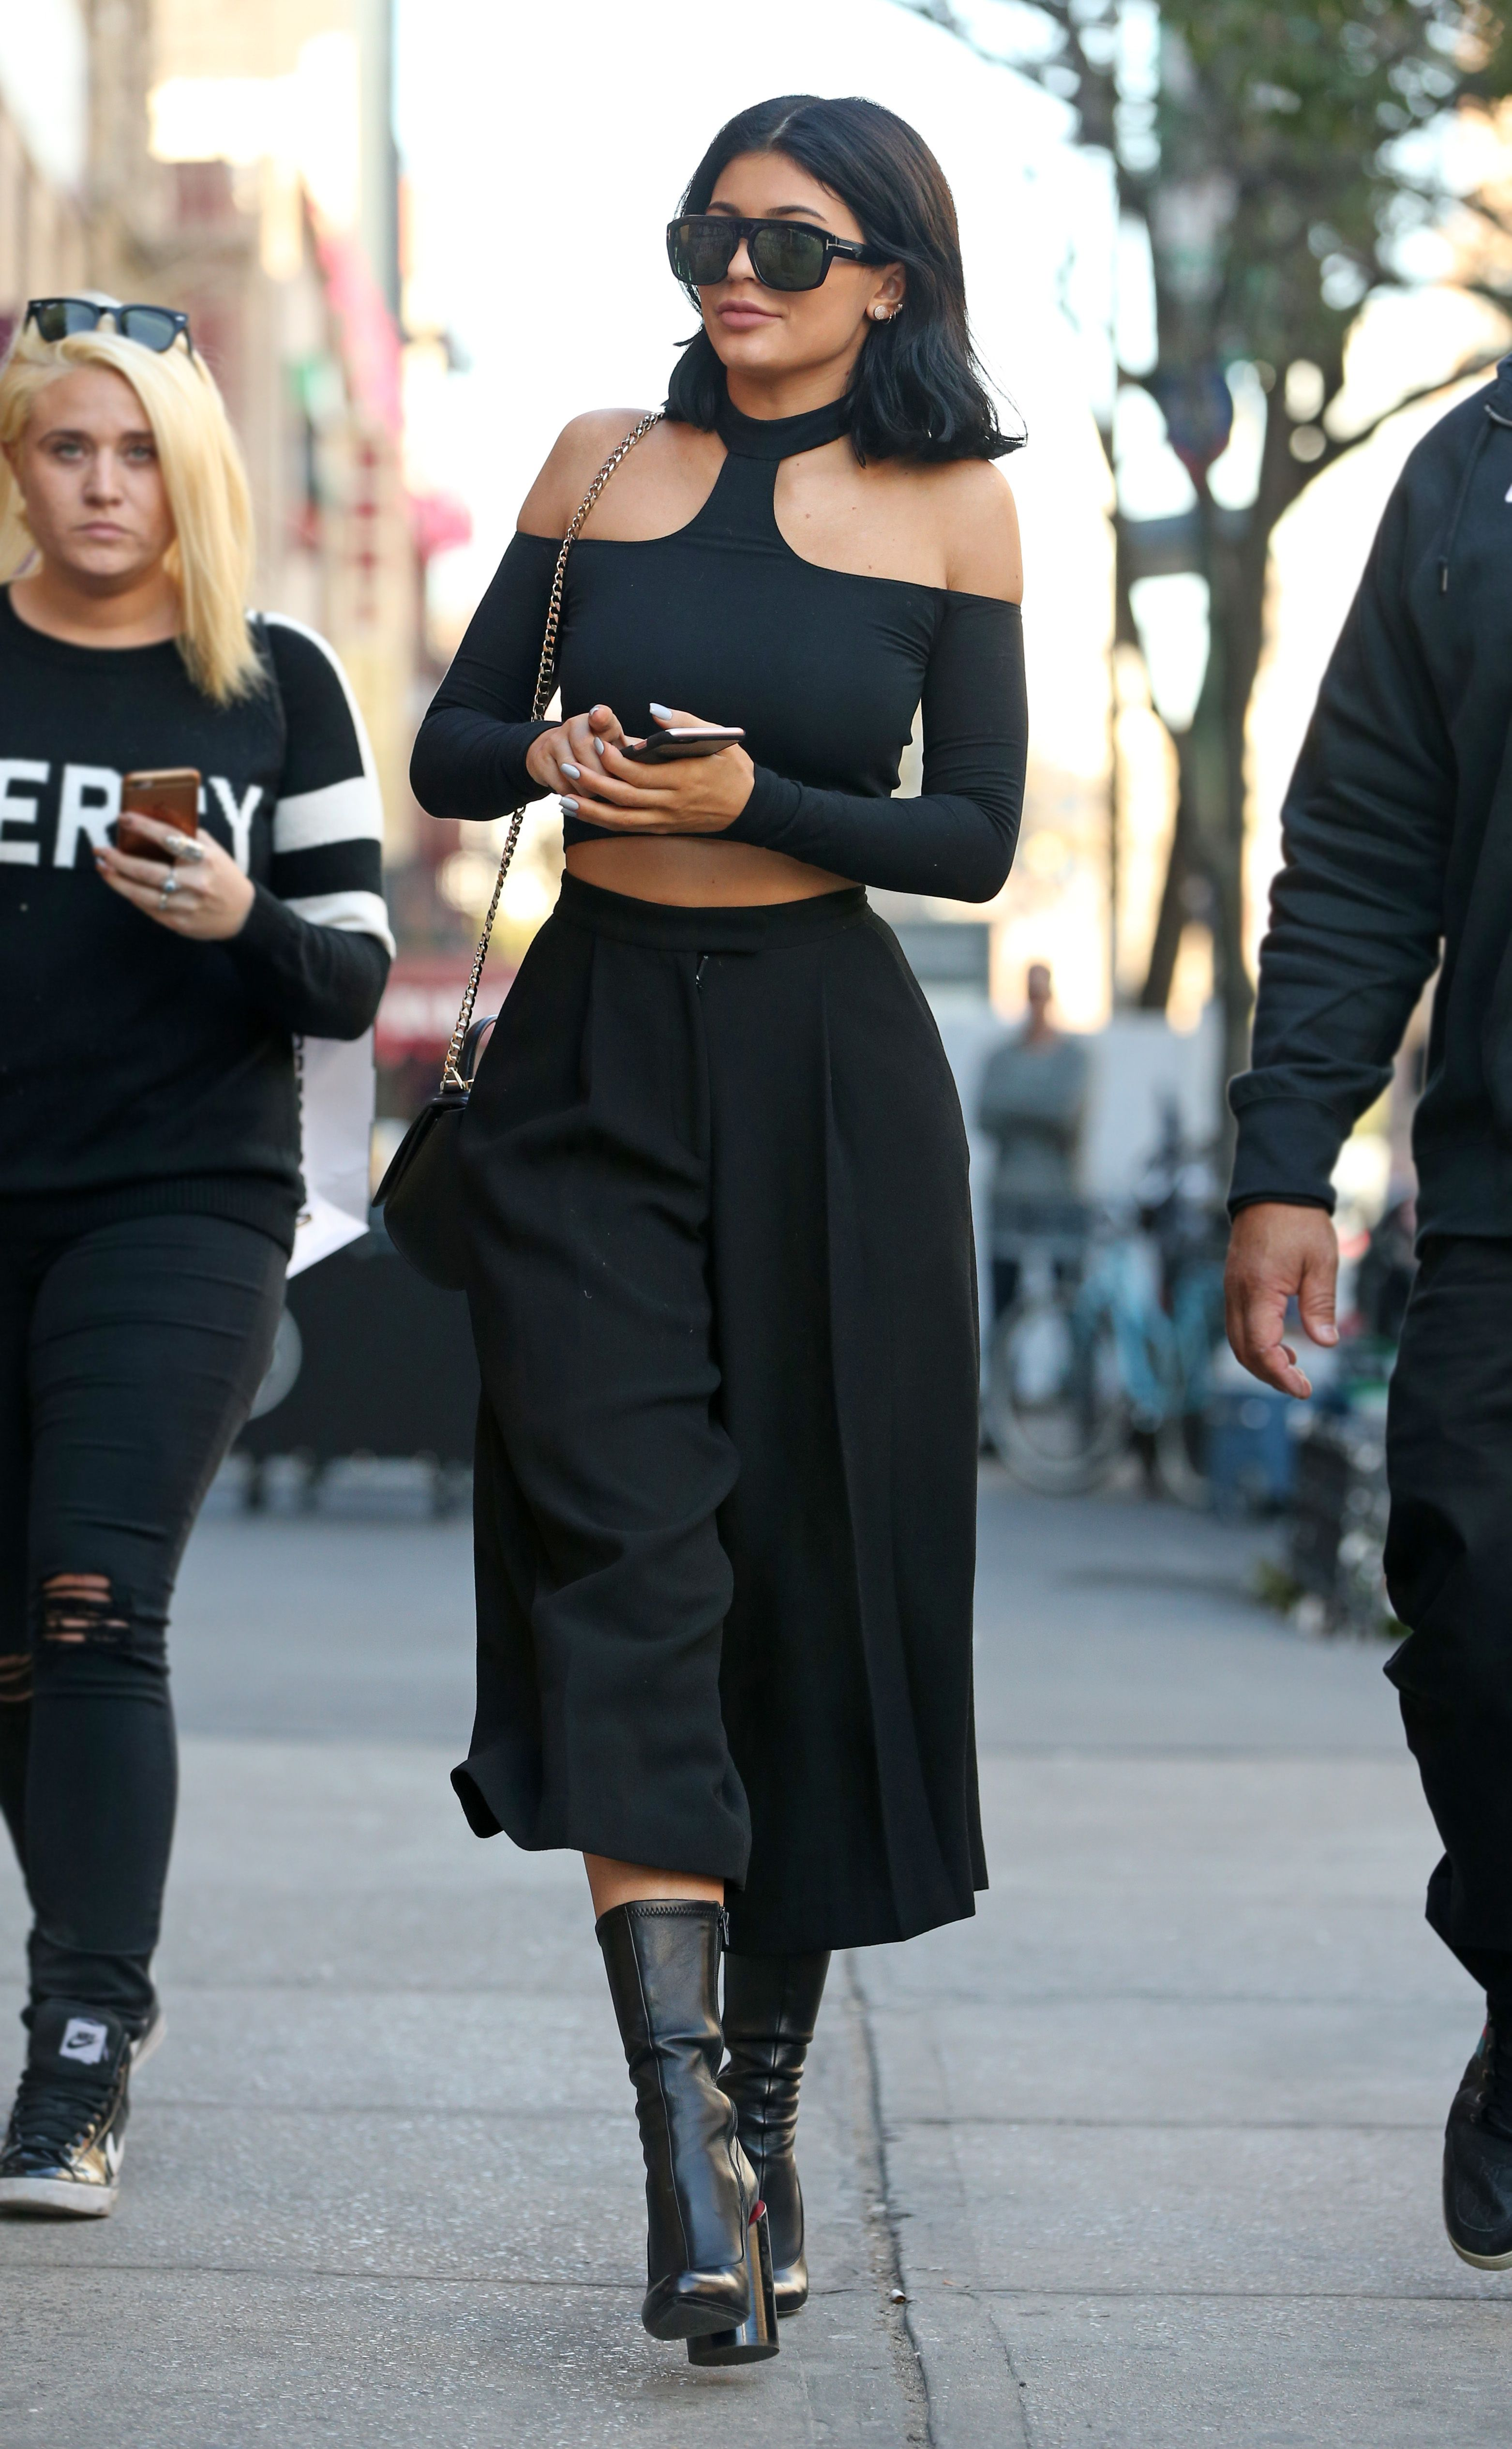 Kendall \u0026 Kylie Jenner\u0027s Best Street Style , Kylie \u0026 Kendall Jenner Fashion